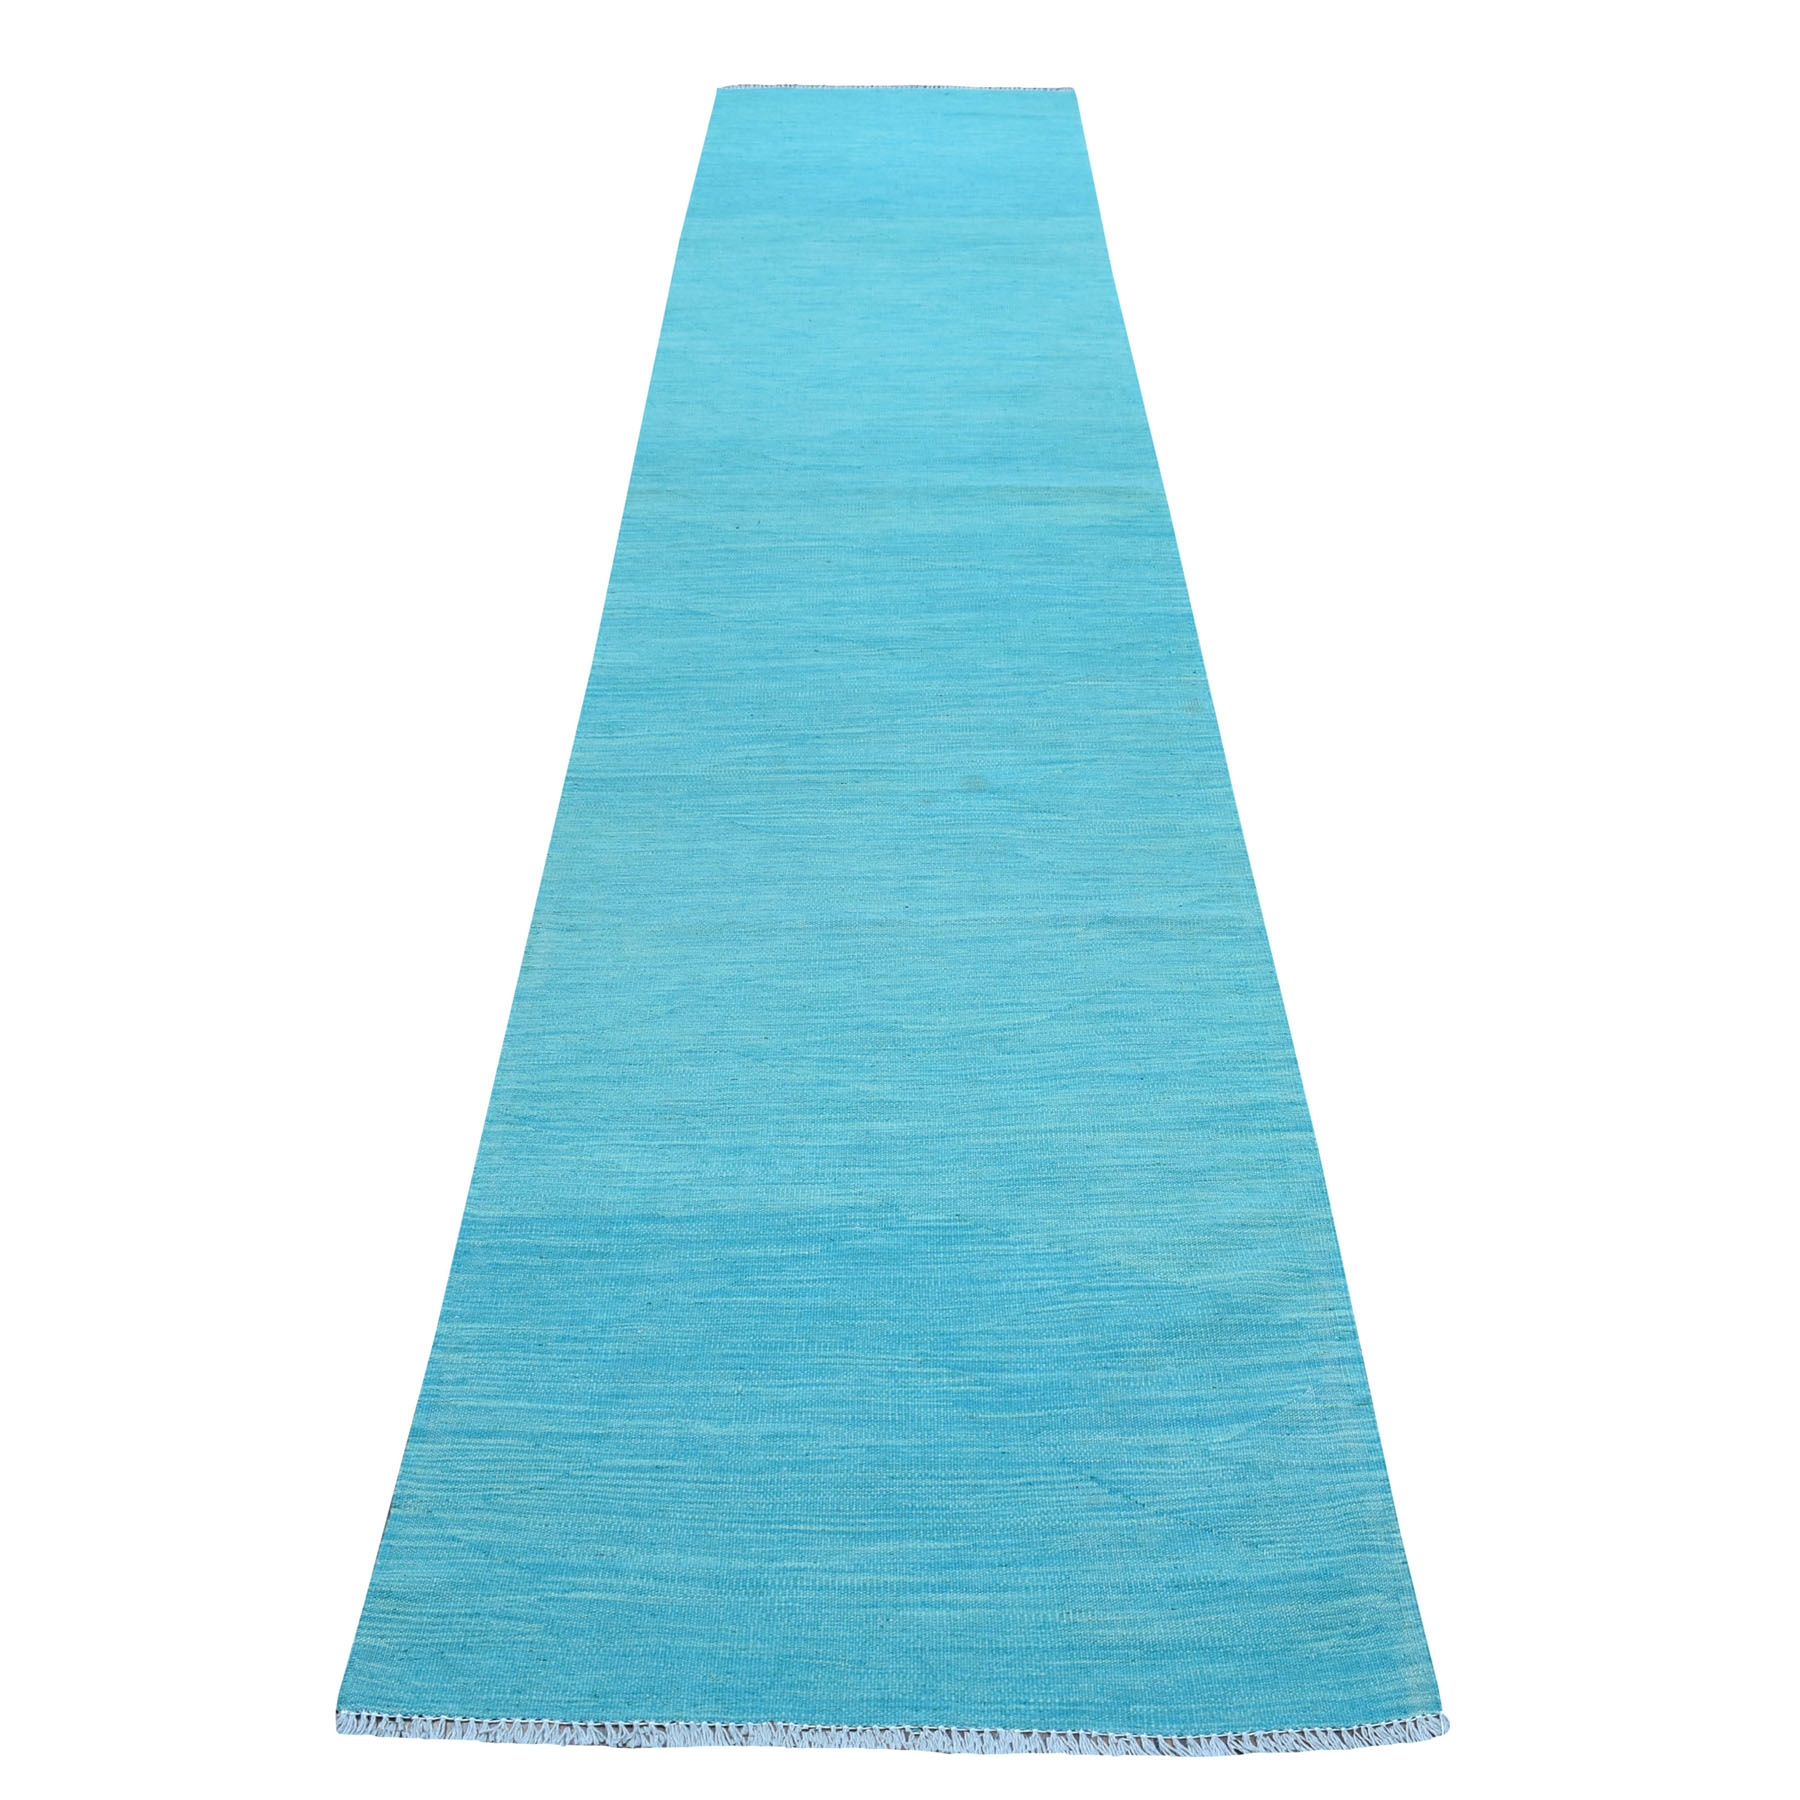 "2'8""X13' Aqua Marine Shades Reversible Kilim Pure Wool Hand Woven Runner Oriental Rug moaec8c0"